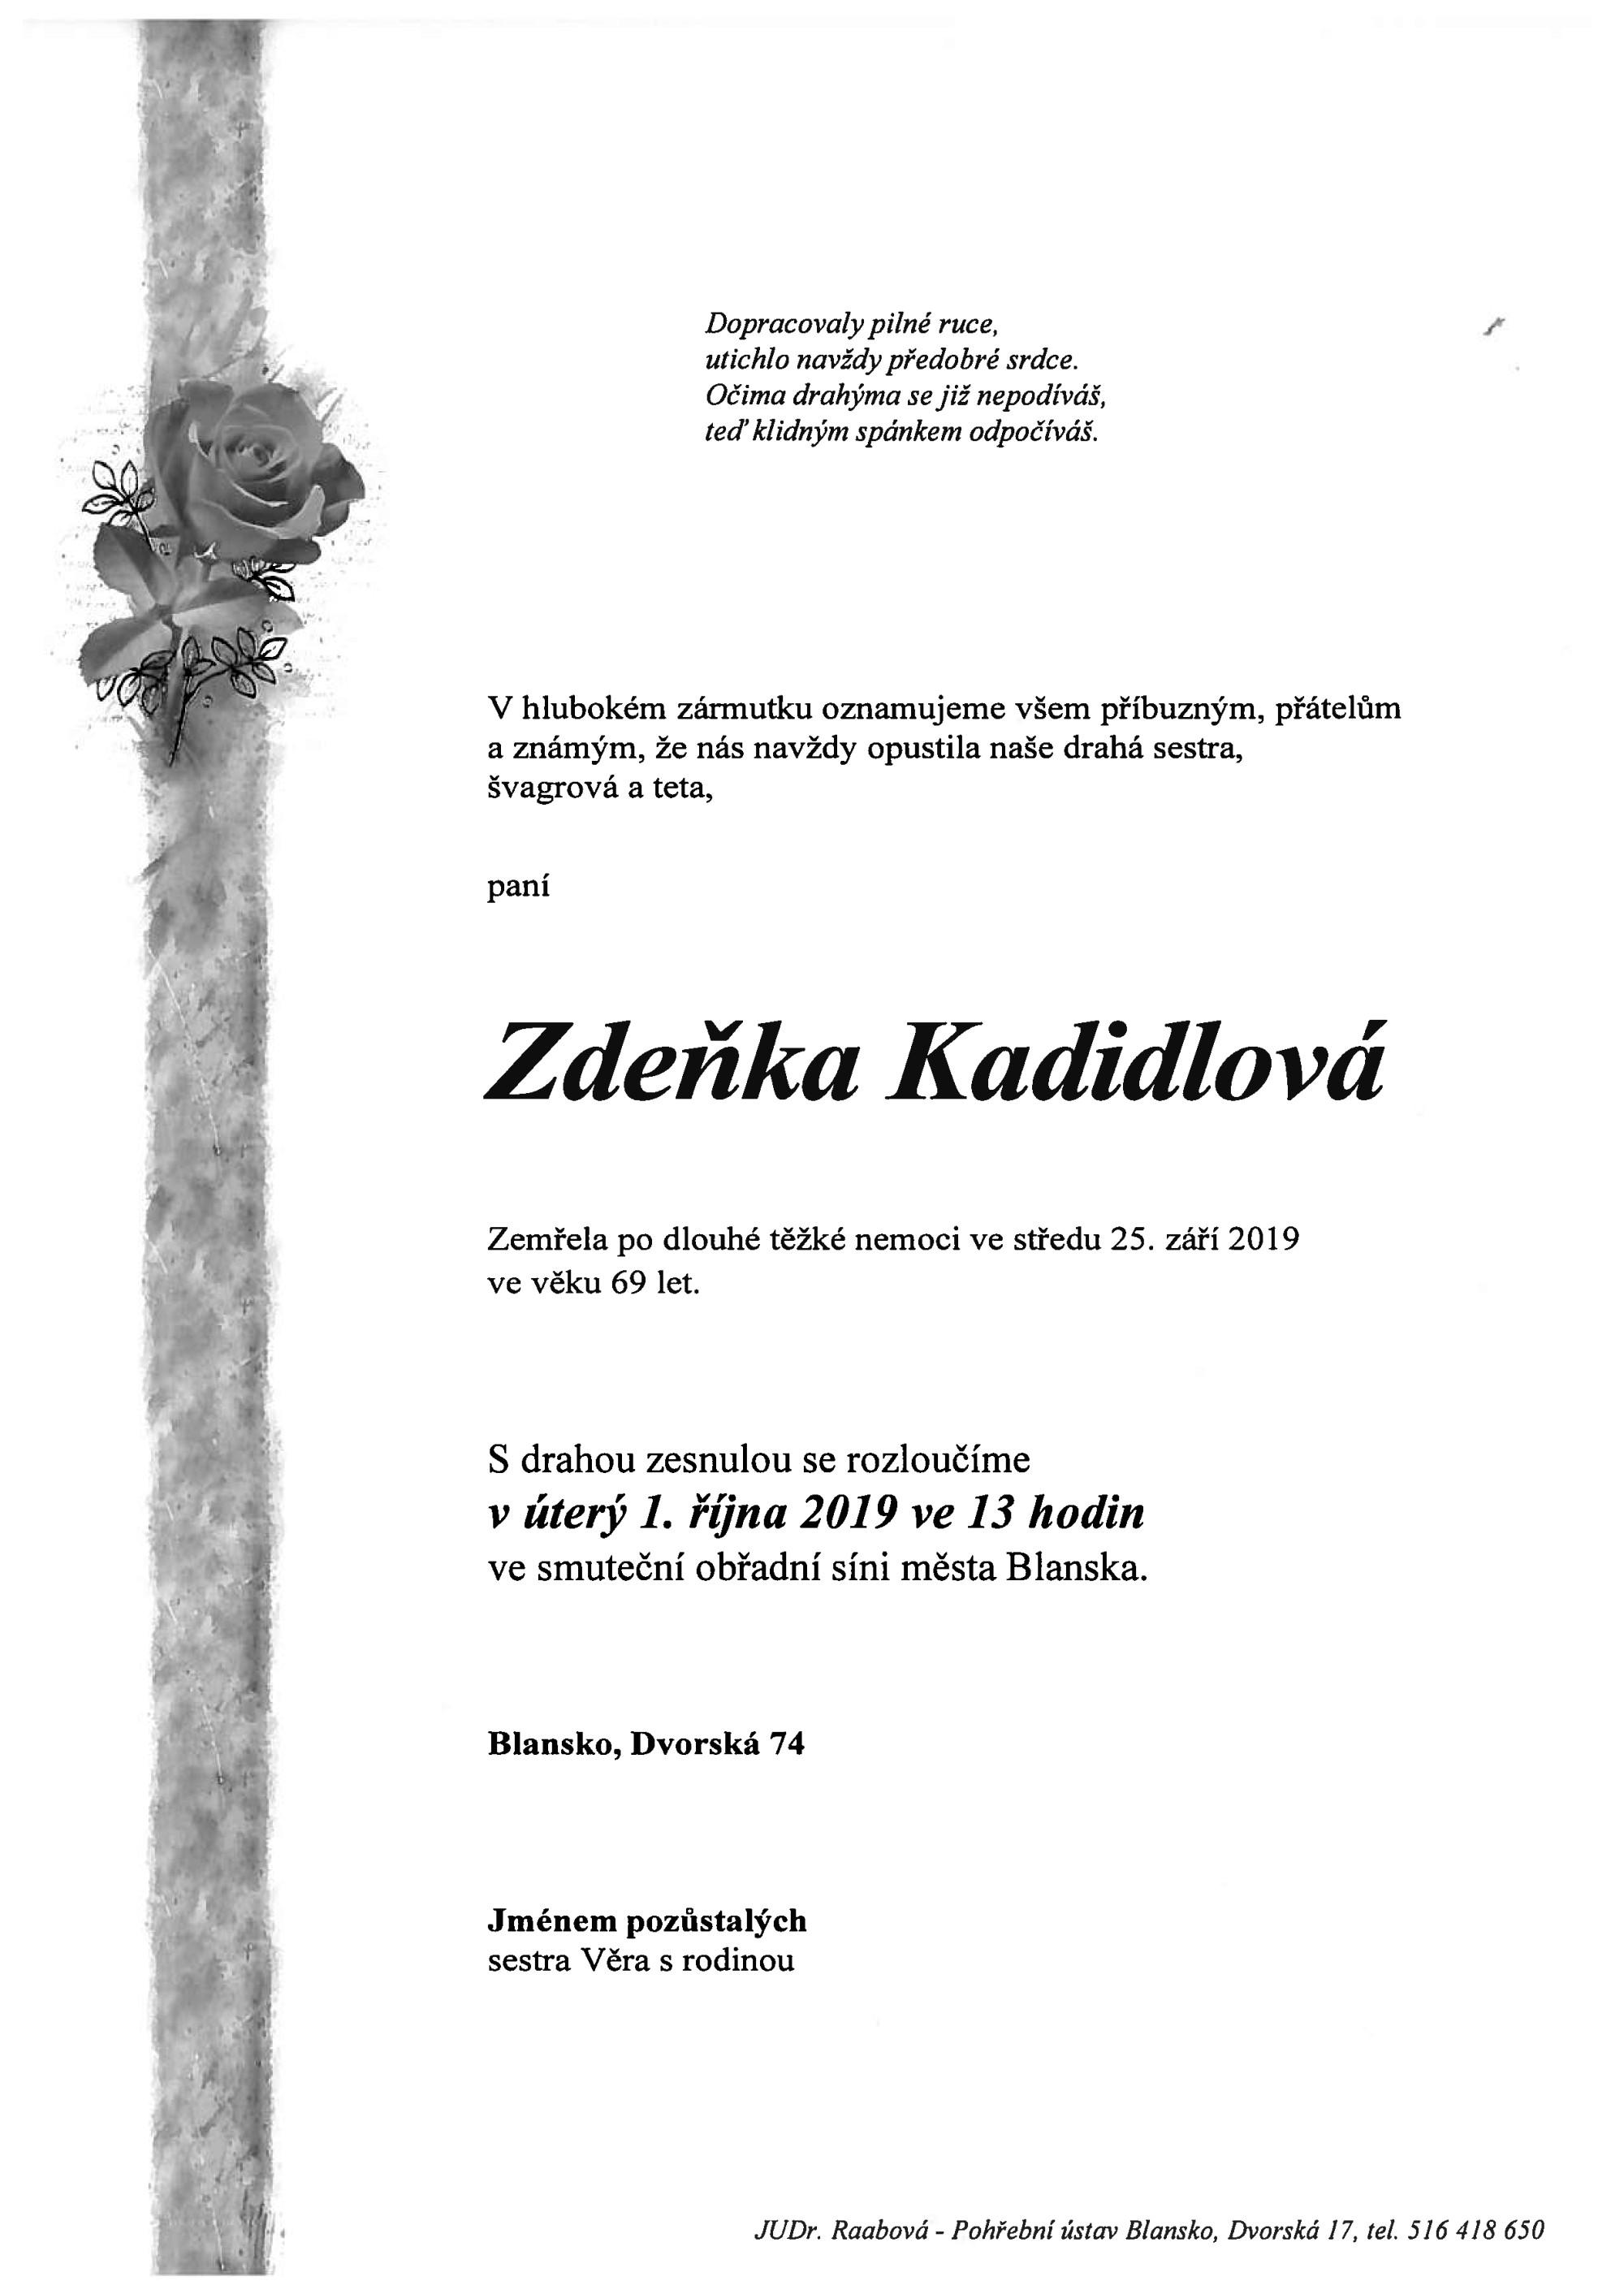 Zdeňka Kadidlová